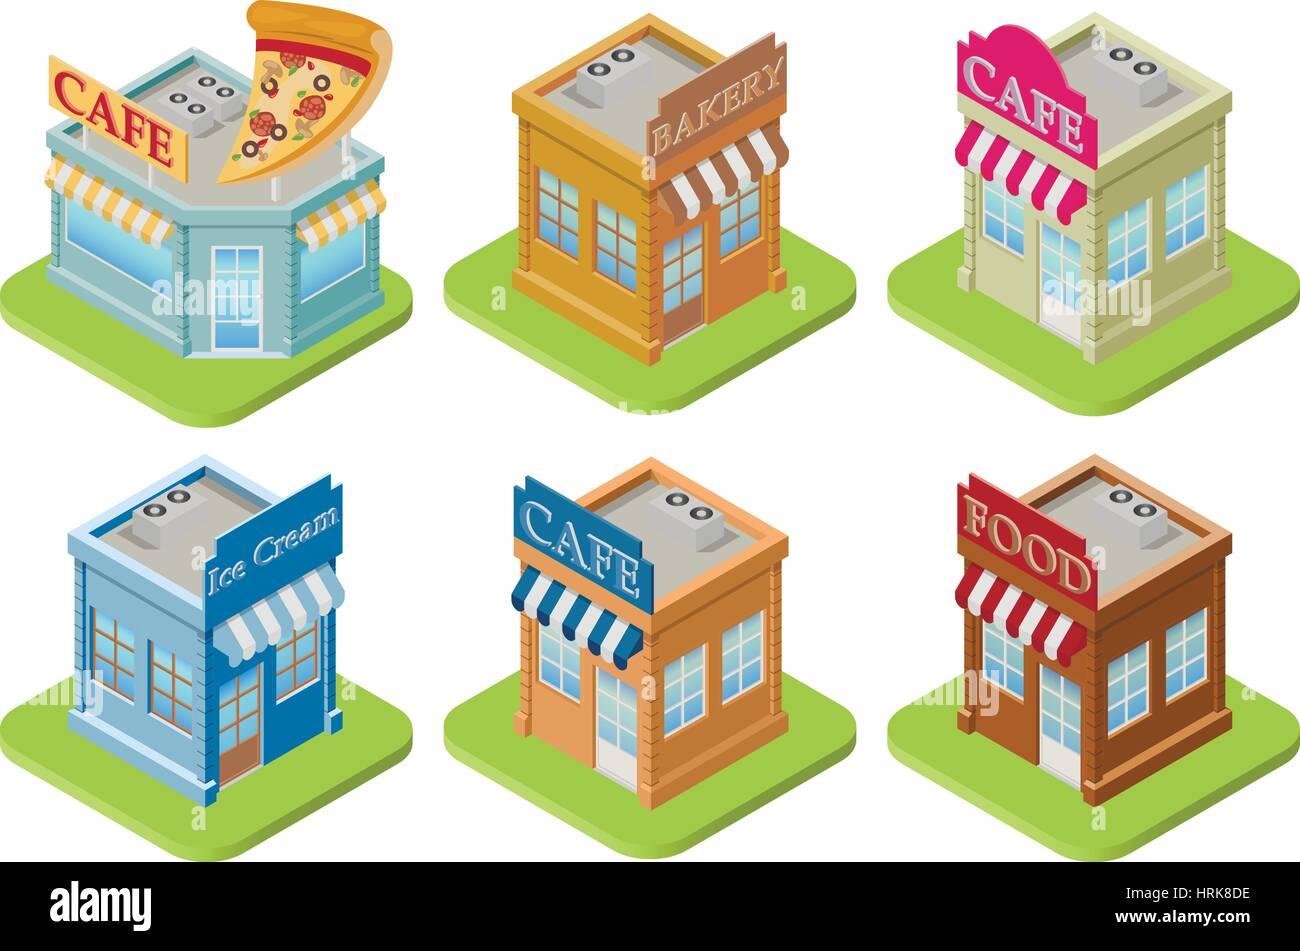 Set of isometric buildings - Stock Image